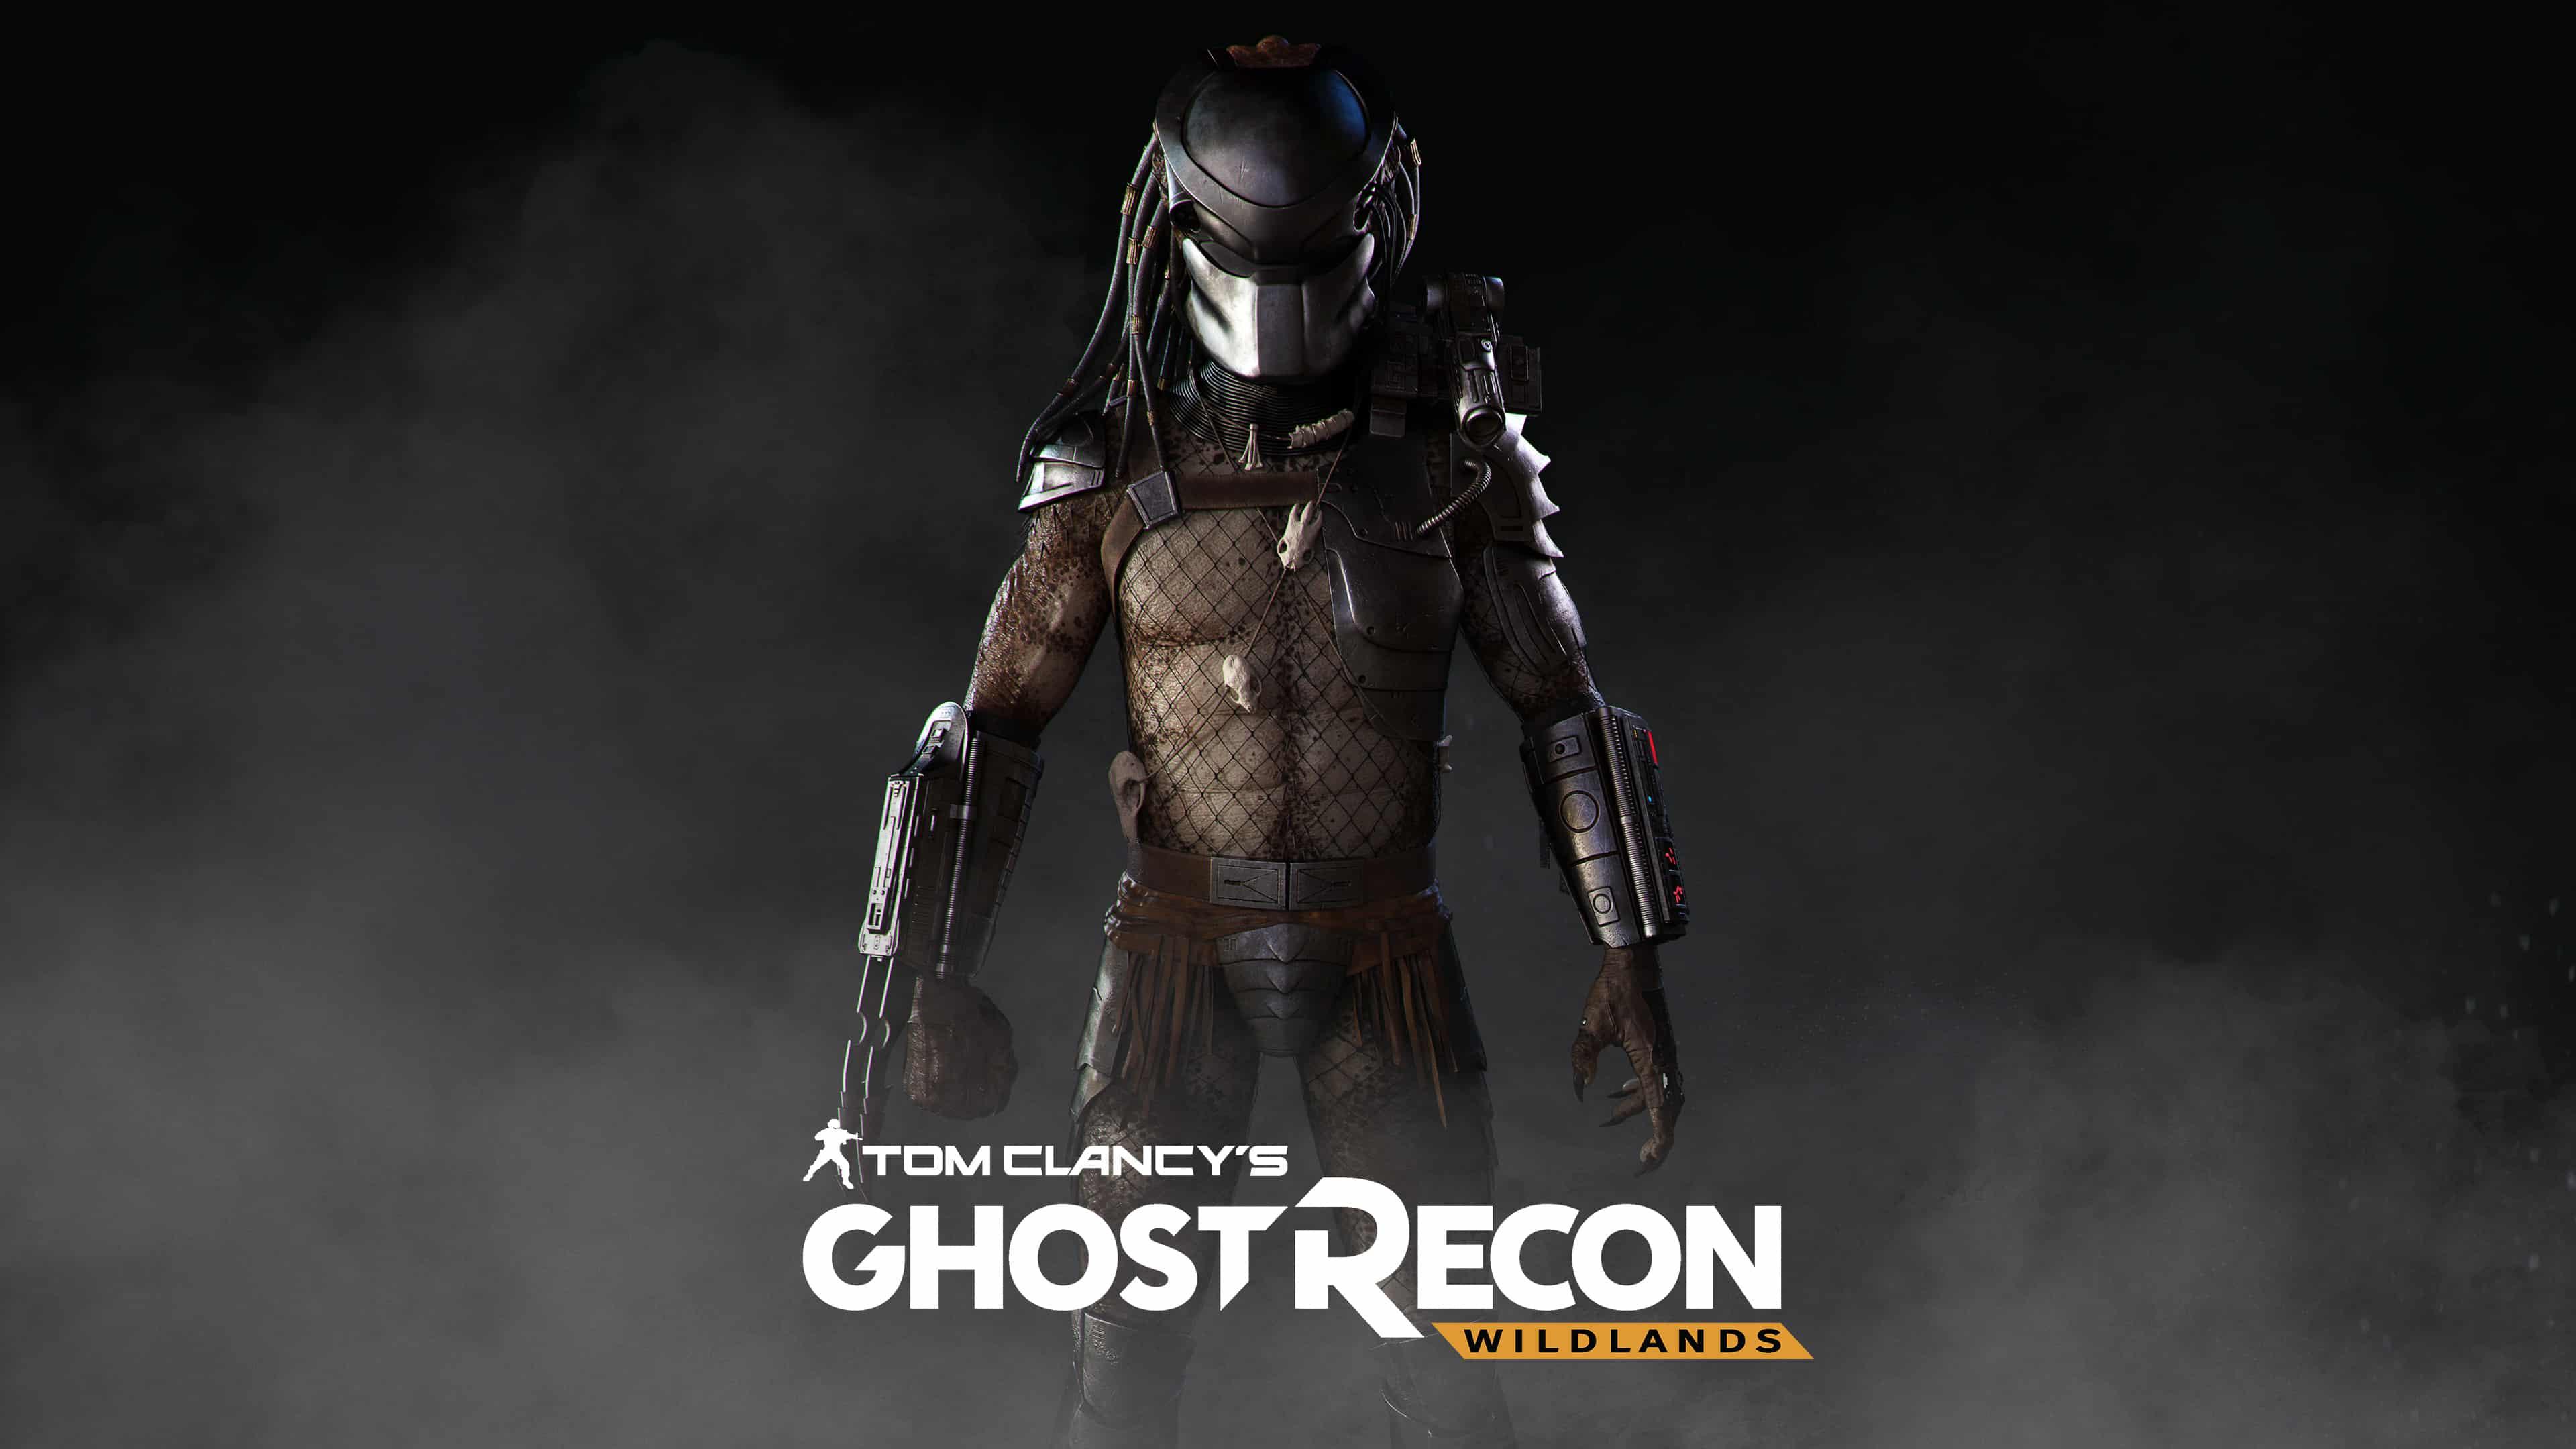 Tom Clancys Ghost Recon Wildlands Predator Uhd 4k Wallpaper